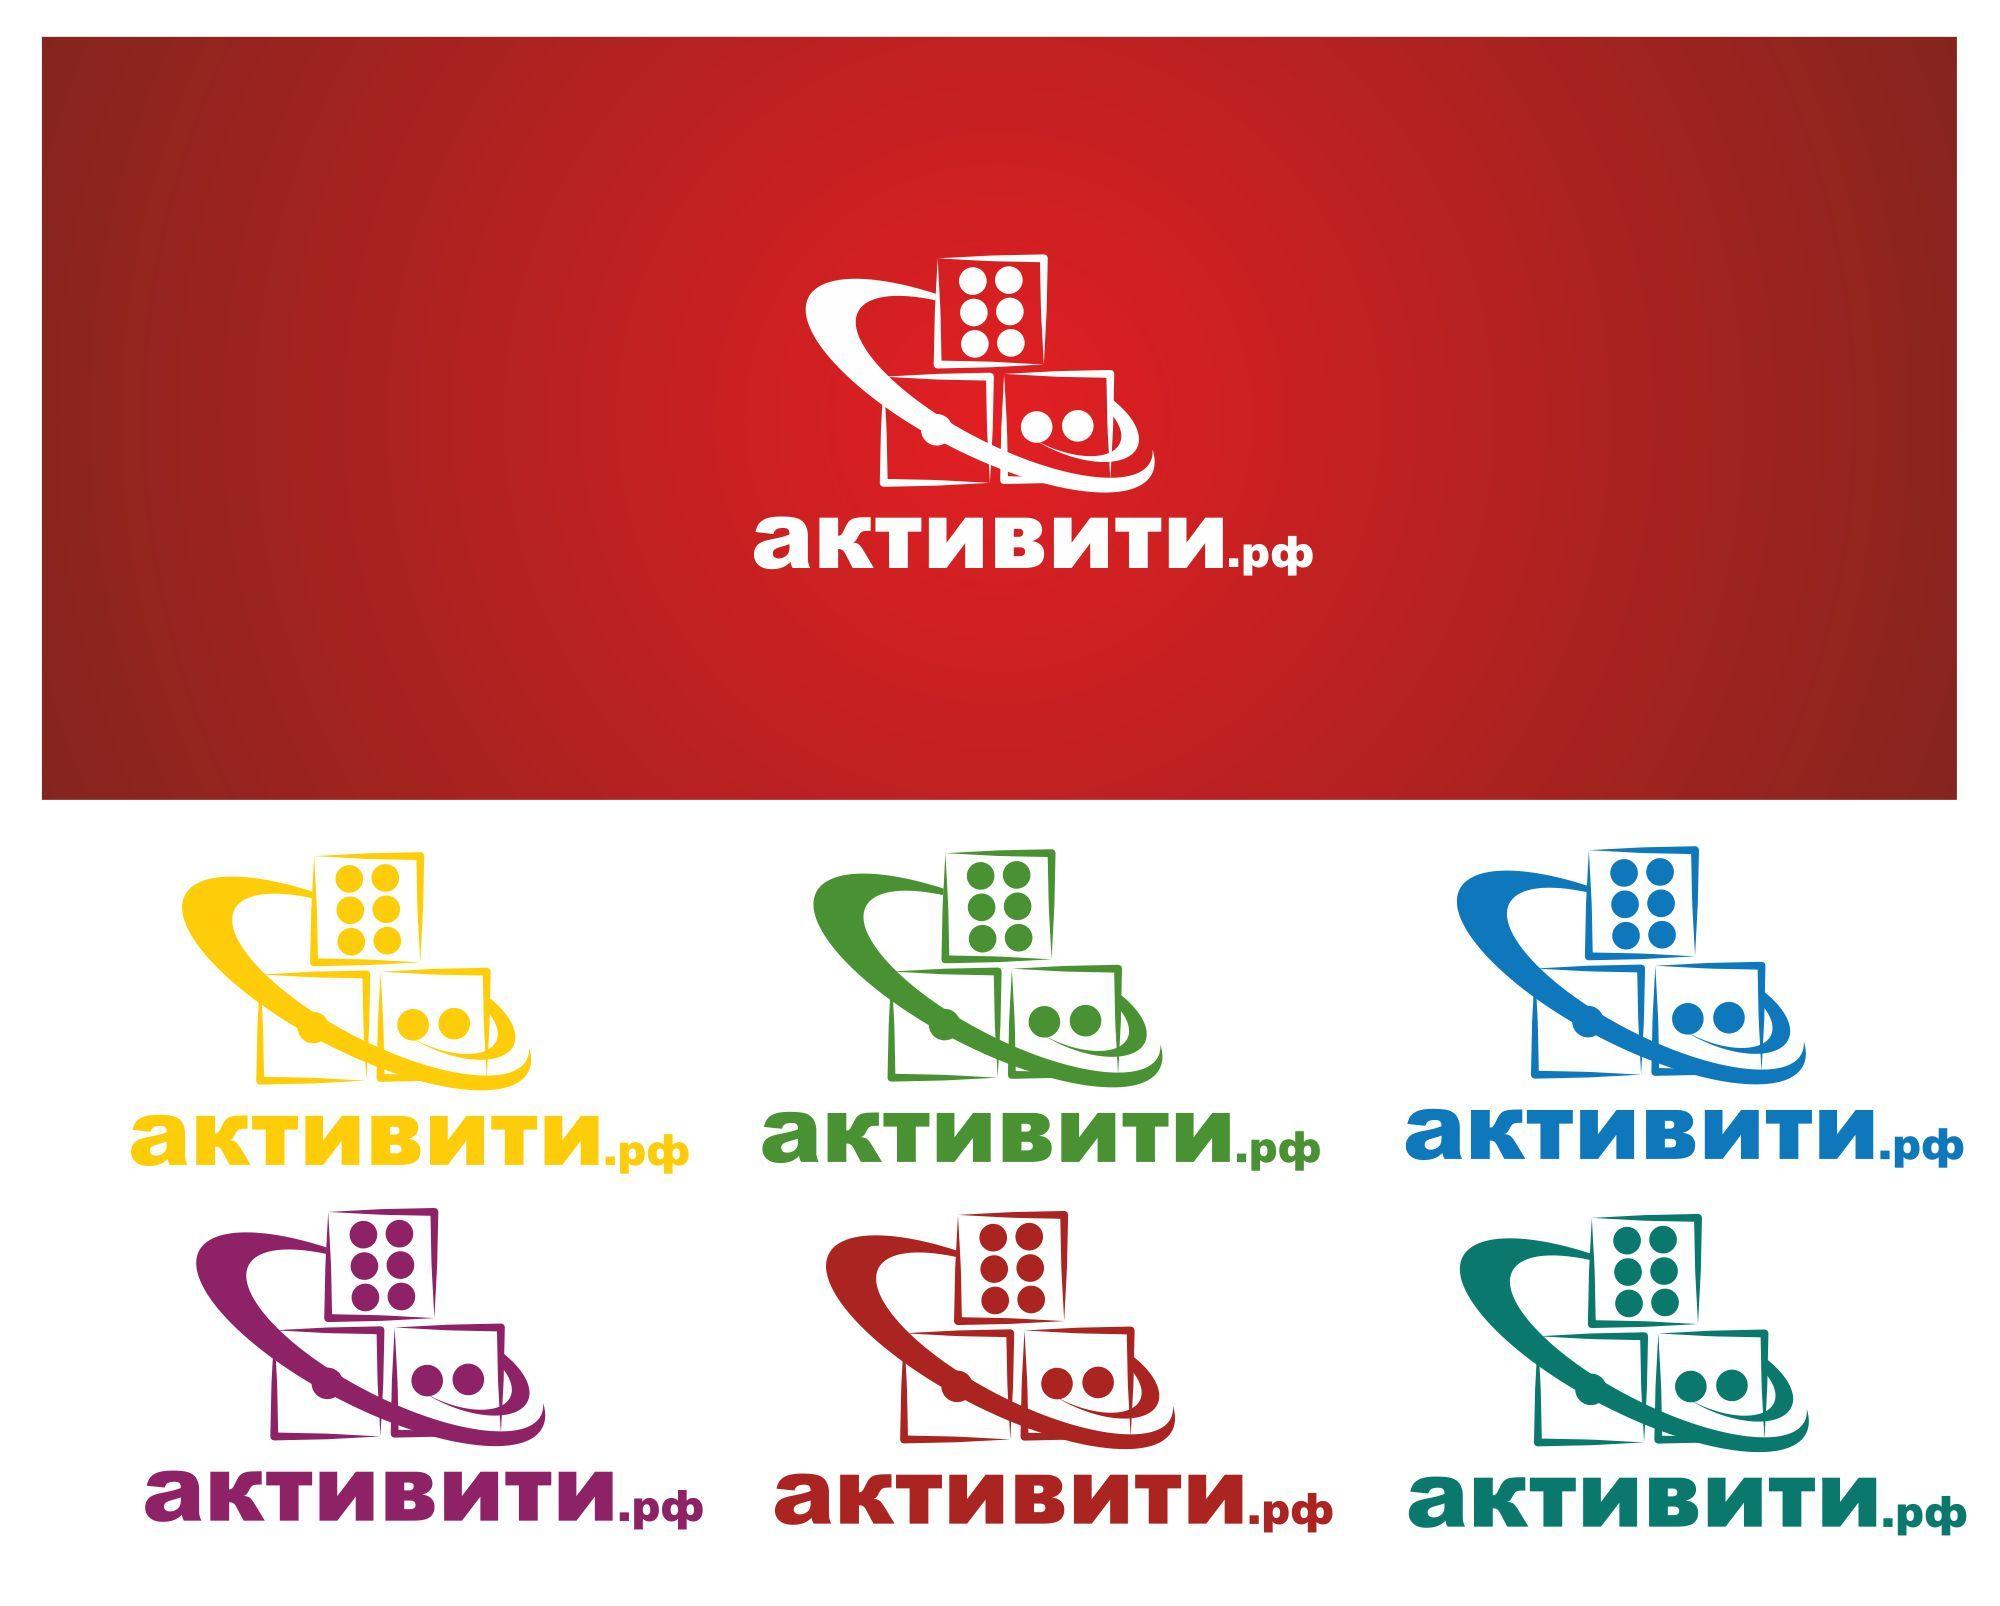 Логотип магазина активити.рф - дизайнер darkbluecat